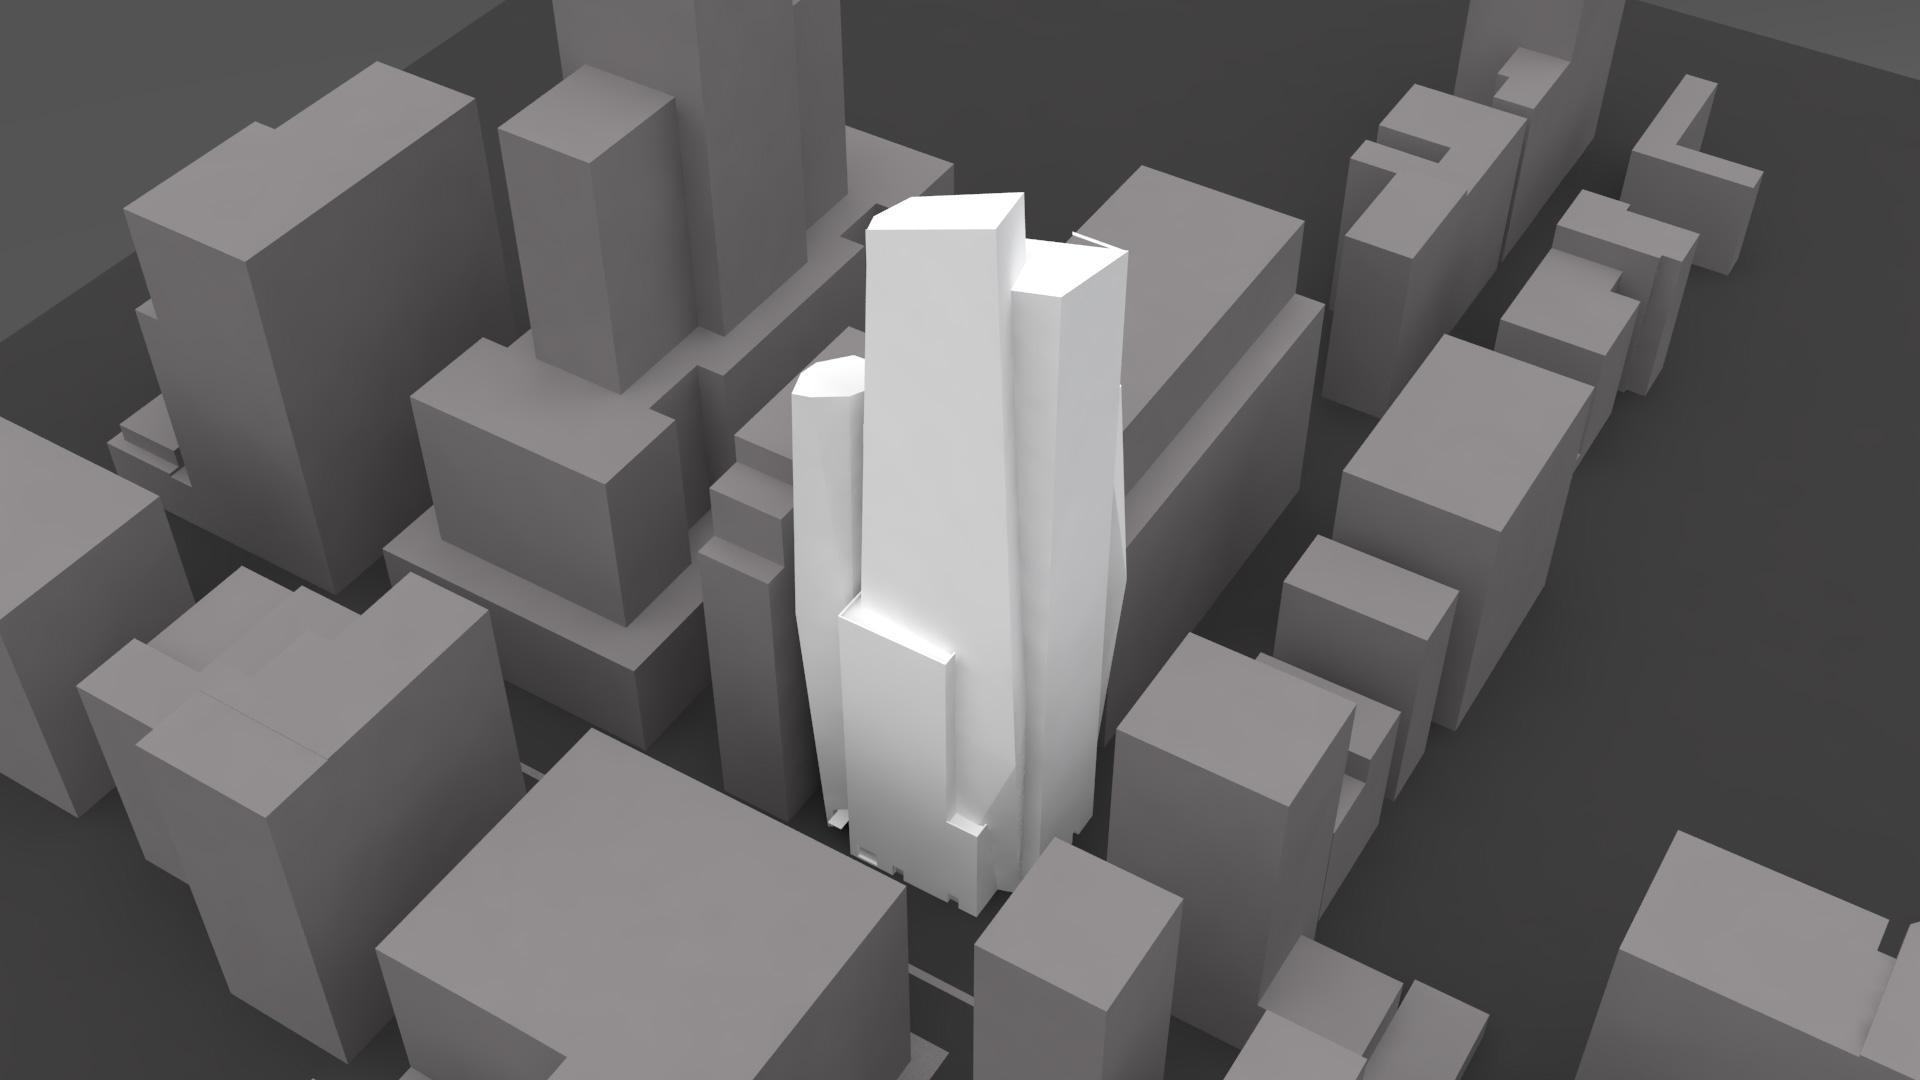 Assonometria in 3D © Christian de Portzamparc